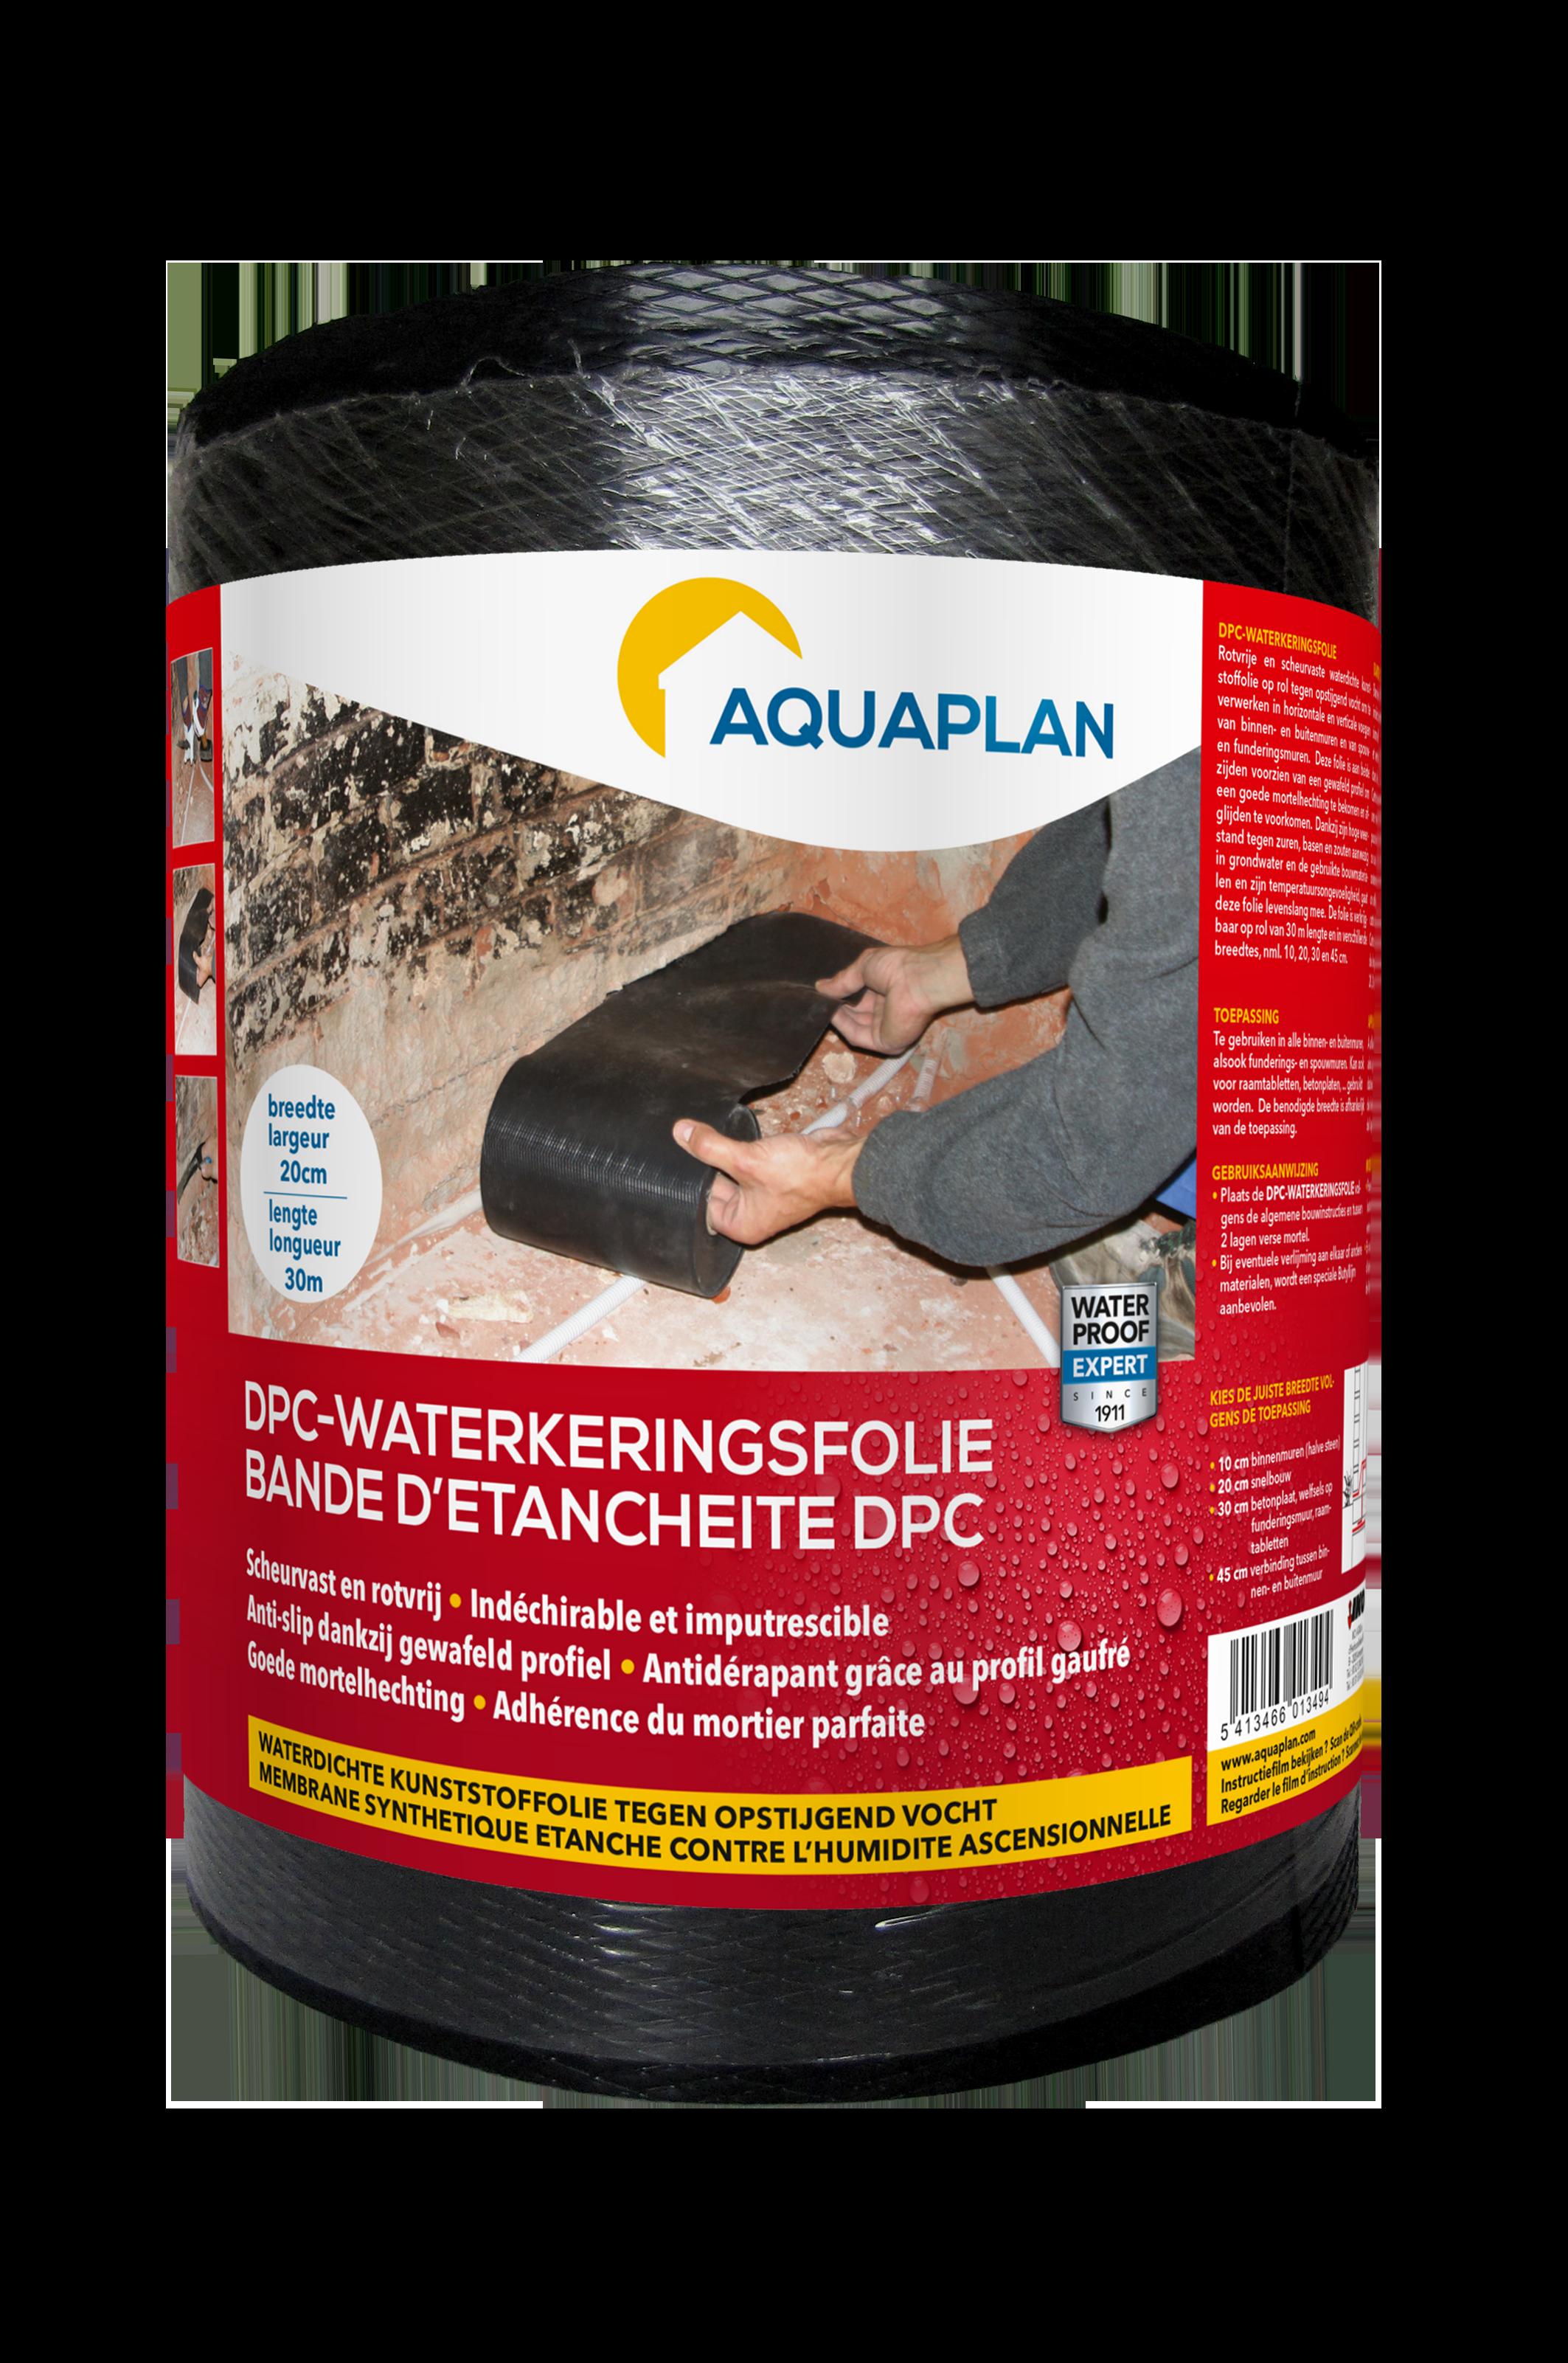 Aquaplan   DPC-Waterkeringsfolie   20 cm